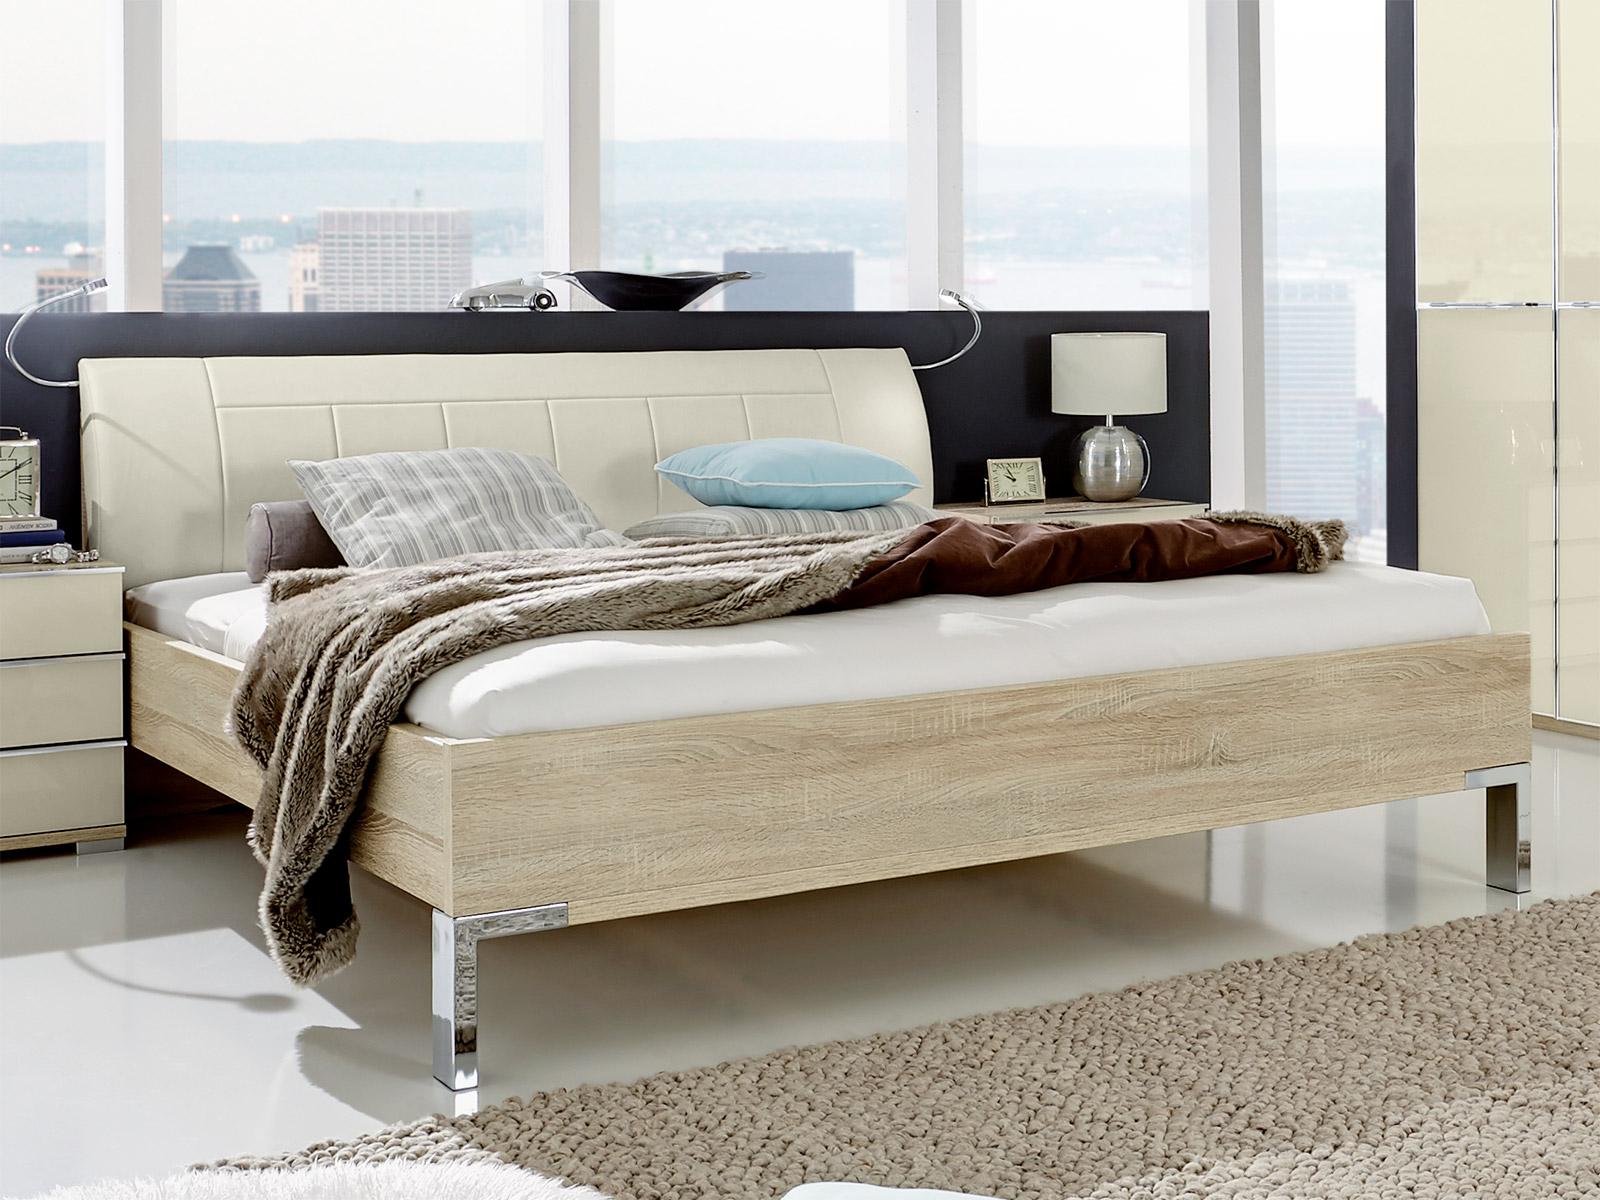 bett 180x200 gnstig gallery of bett komforthhe gnstig kaufen bett x komforthhe fotos von bett. Black Bedroom Furniture Sets. Home Design Ideas